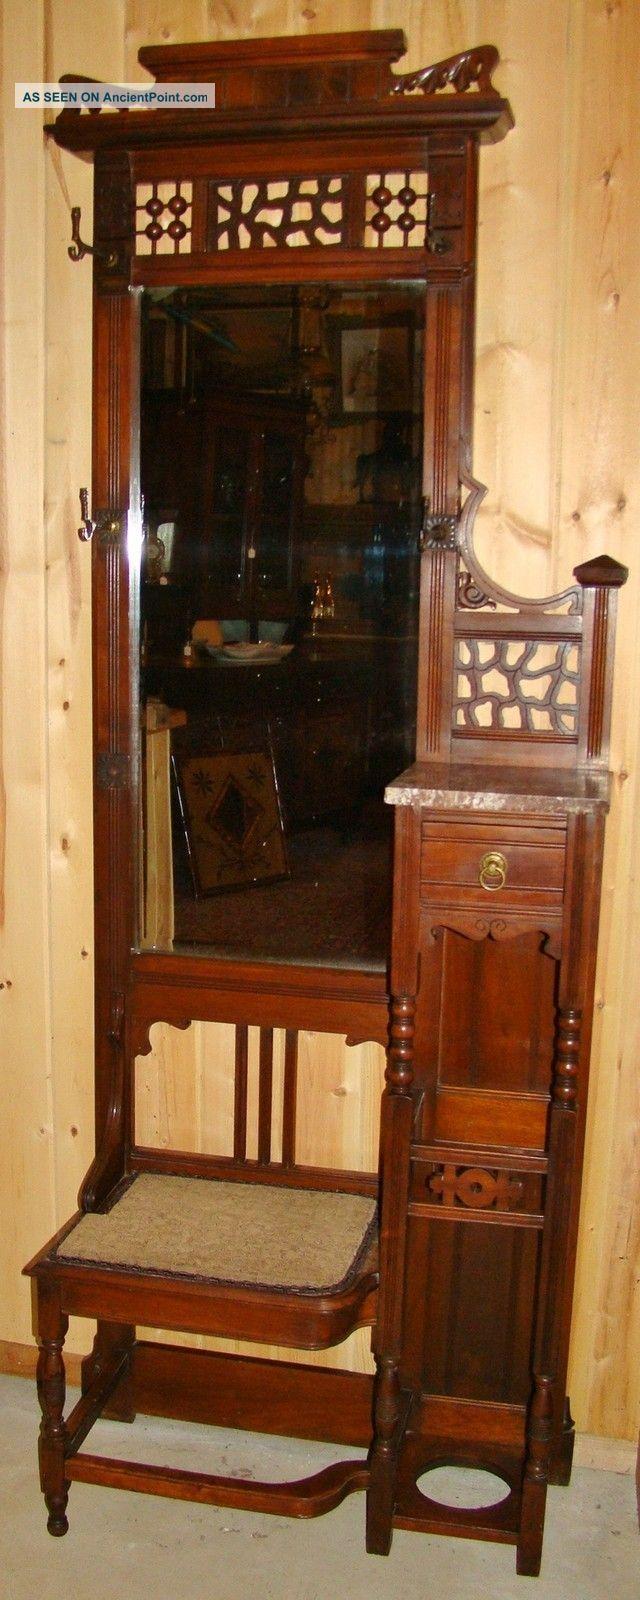 1880 ' S Walnut Stick & Ball Hallseat With Marble,  Drawer,  Beveled Mirror 1800-1899 photo